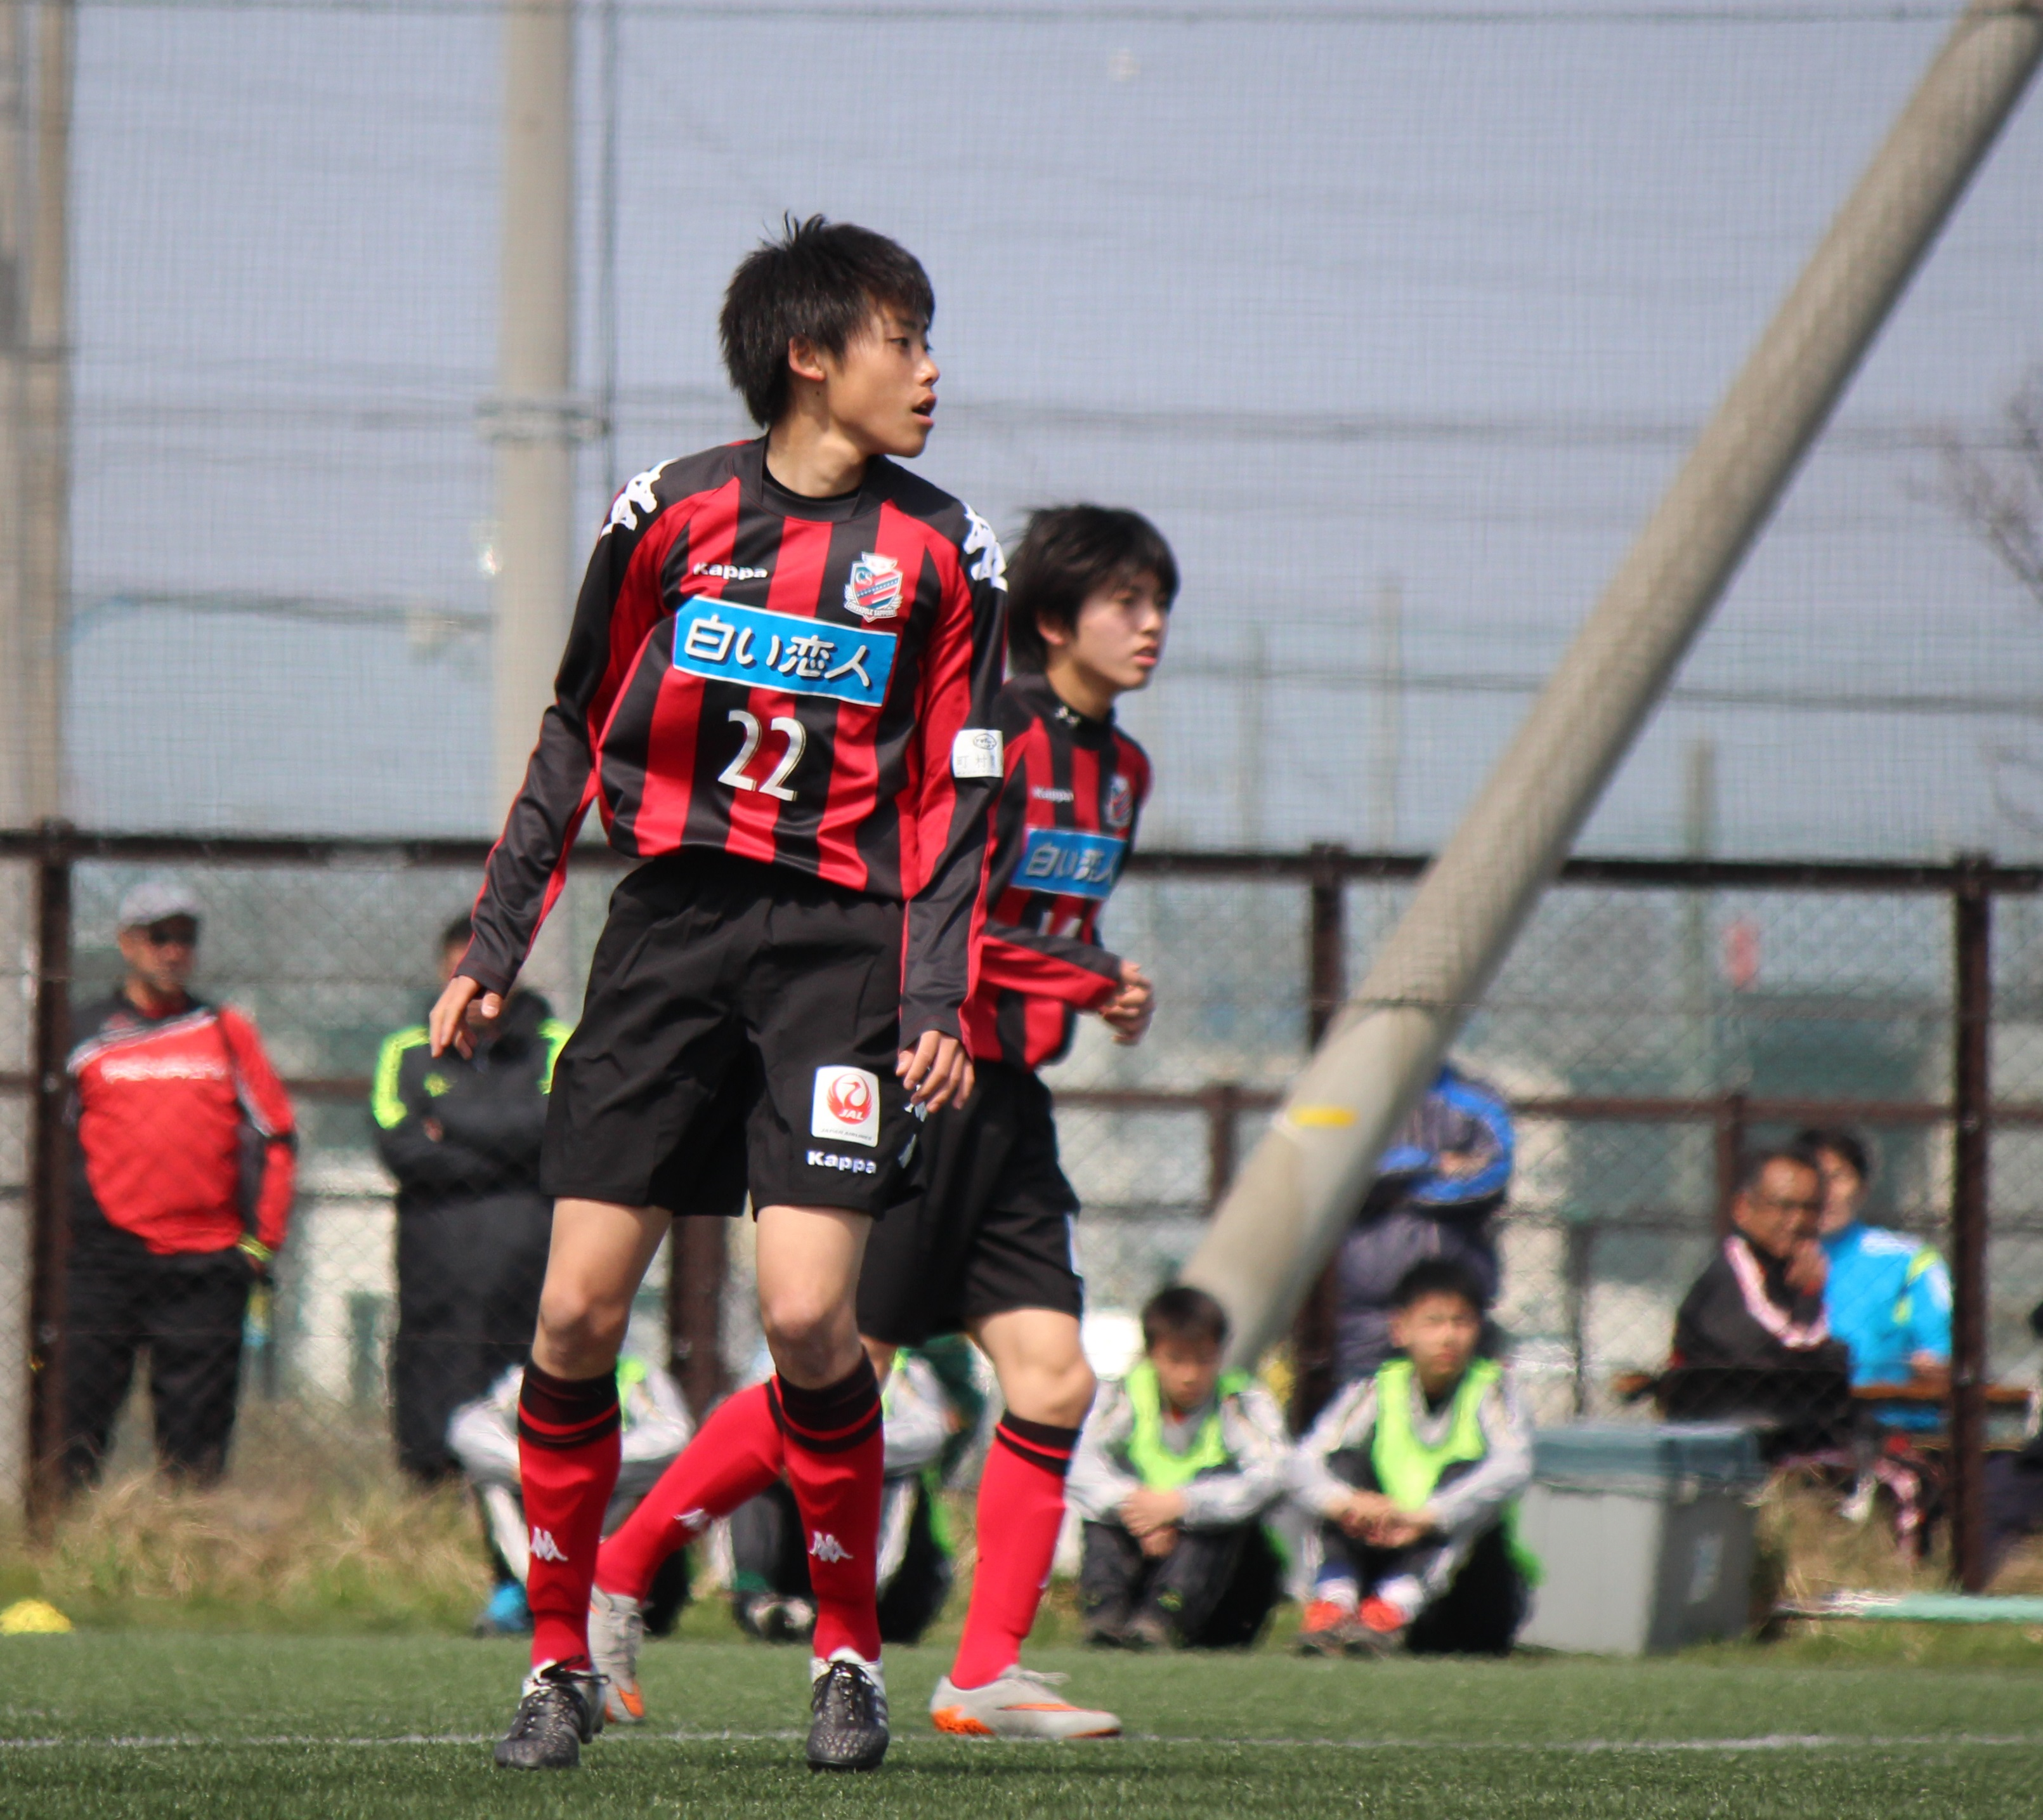 http://chsc.jp/news/up_images/igawasora.jpg